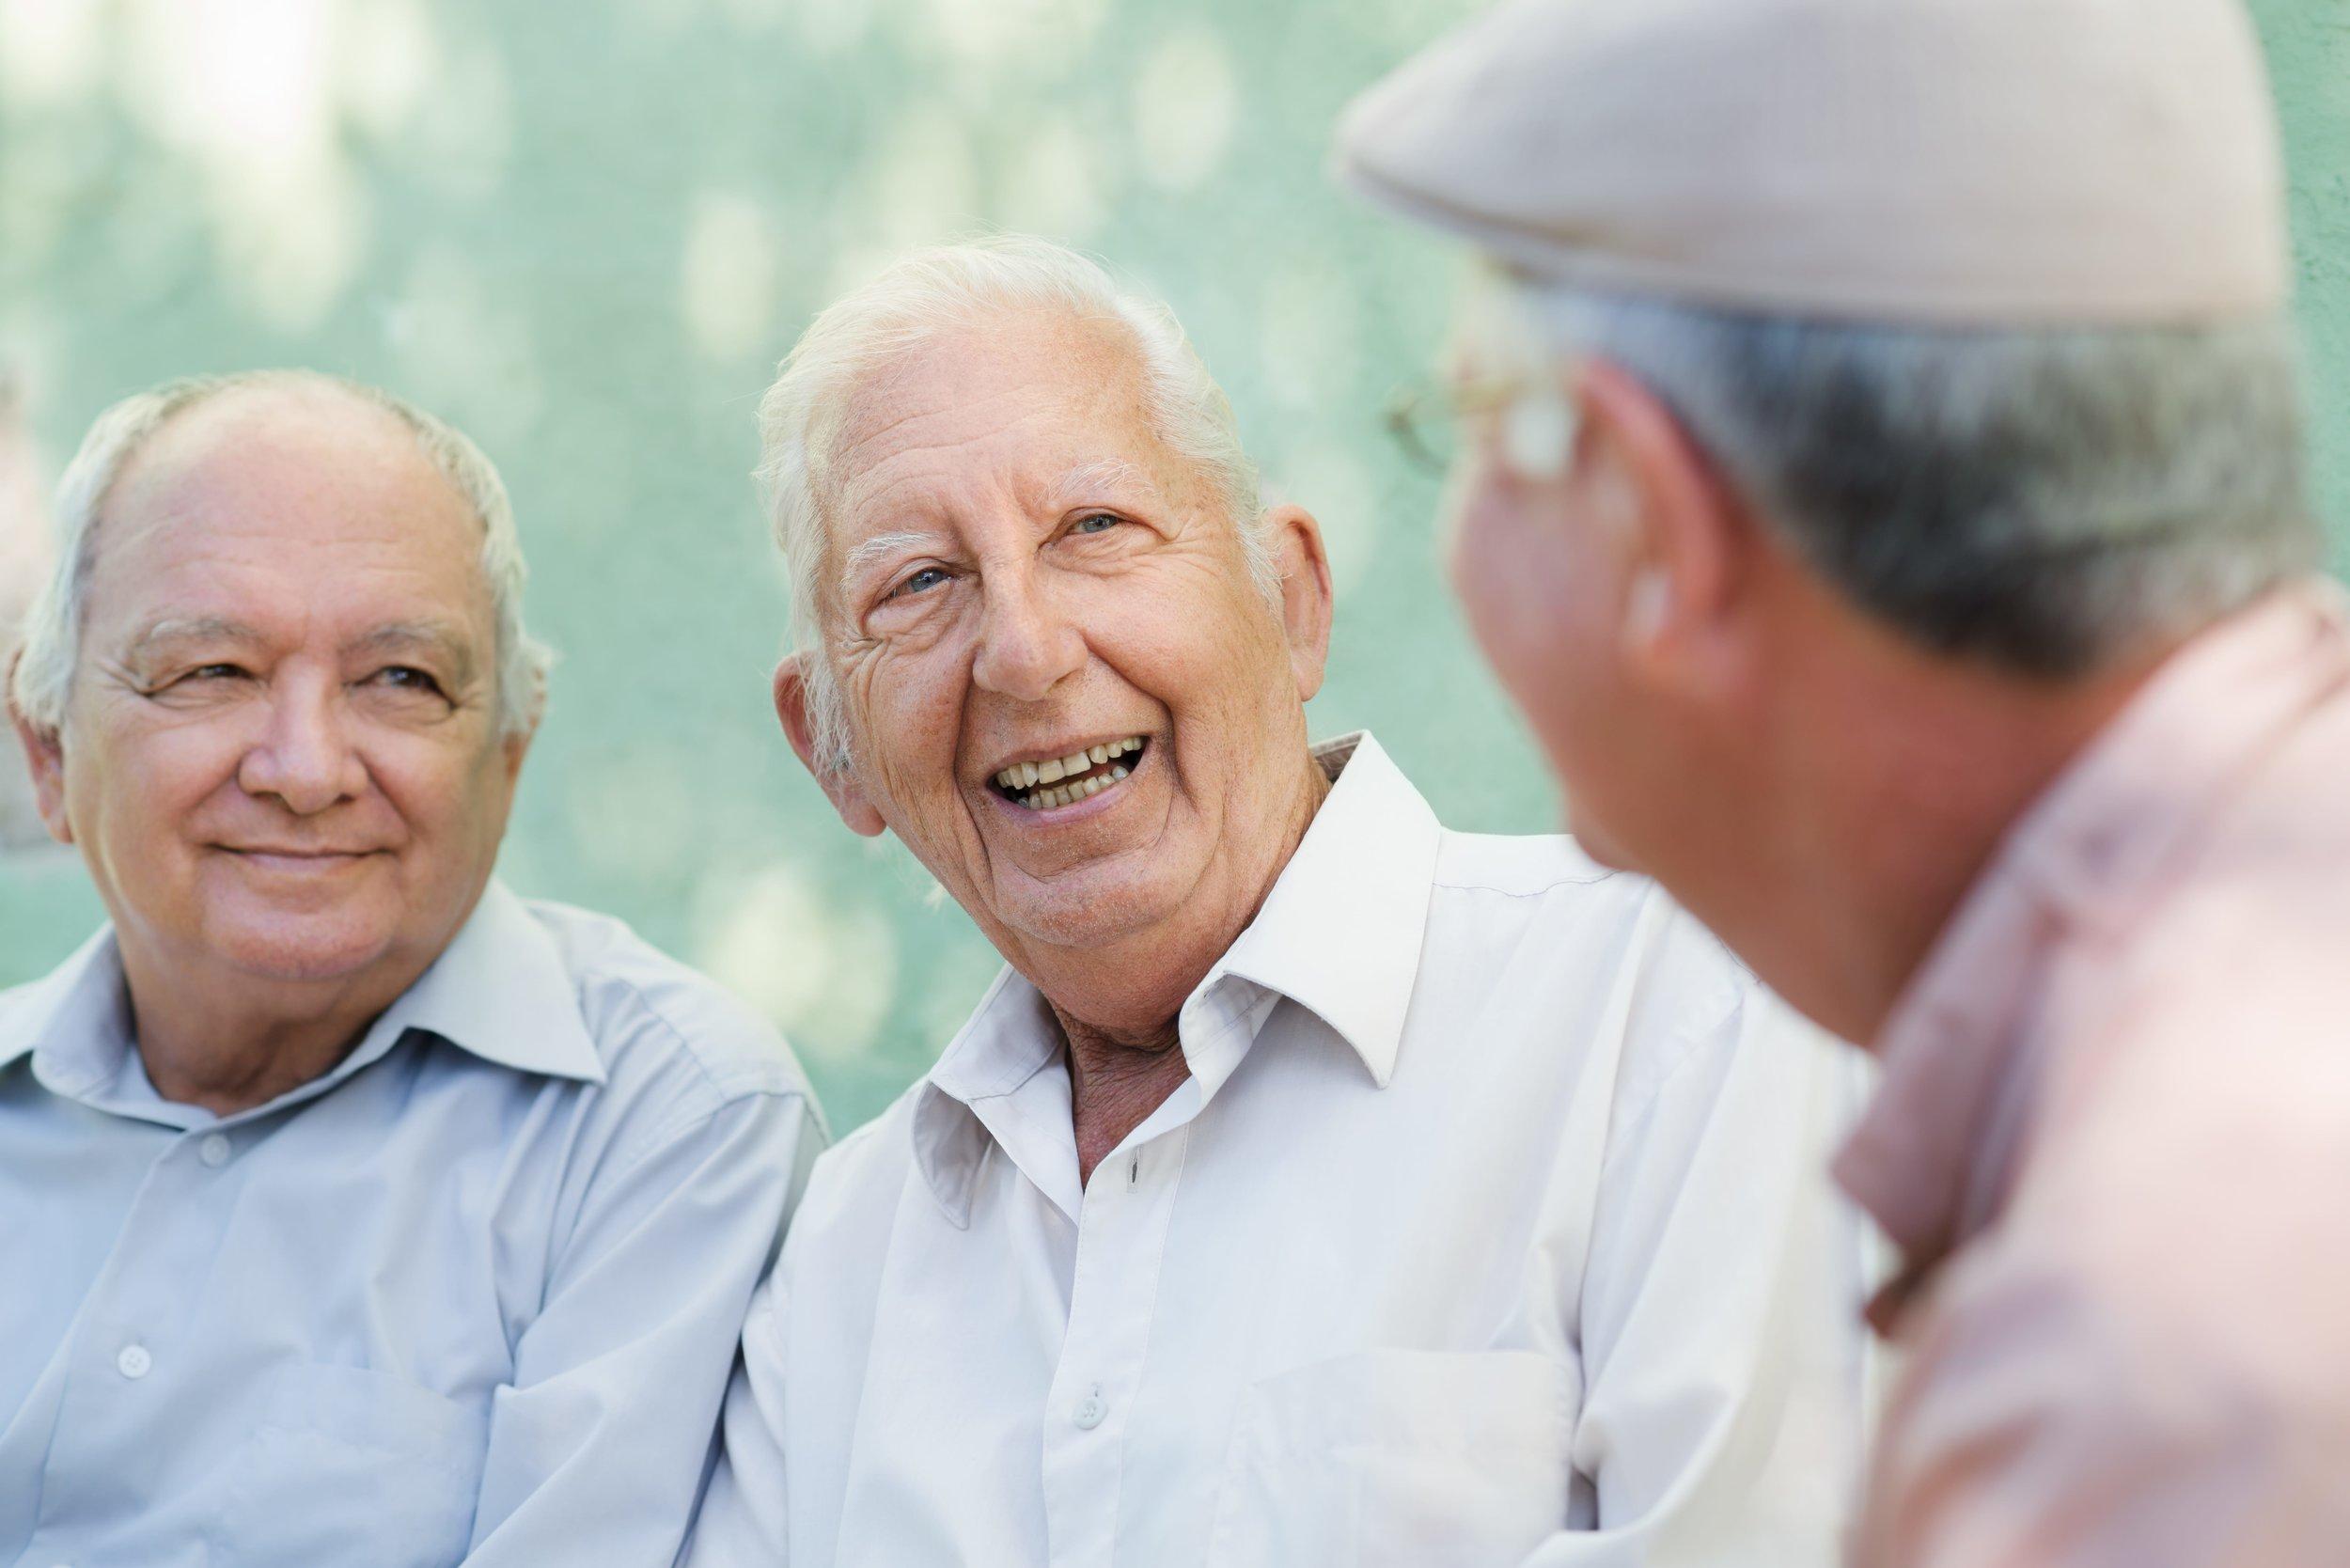 Dentures, Veneers, Implants?   Whatever your need, we can help.   Learn More